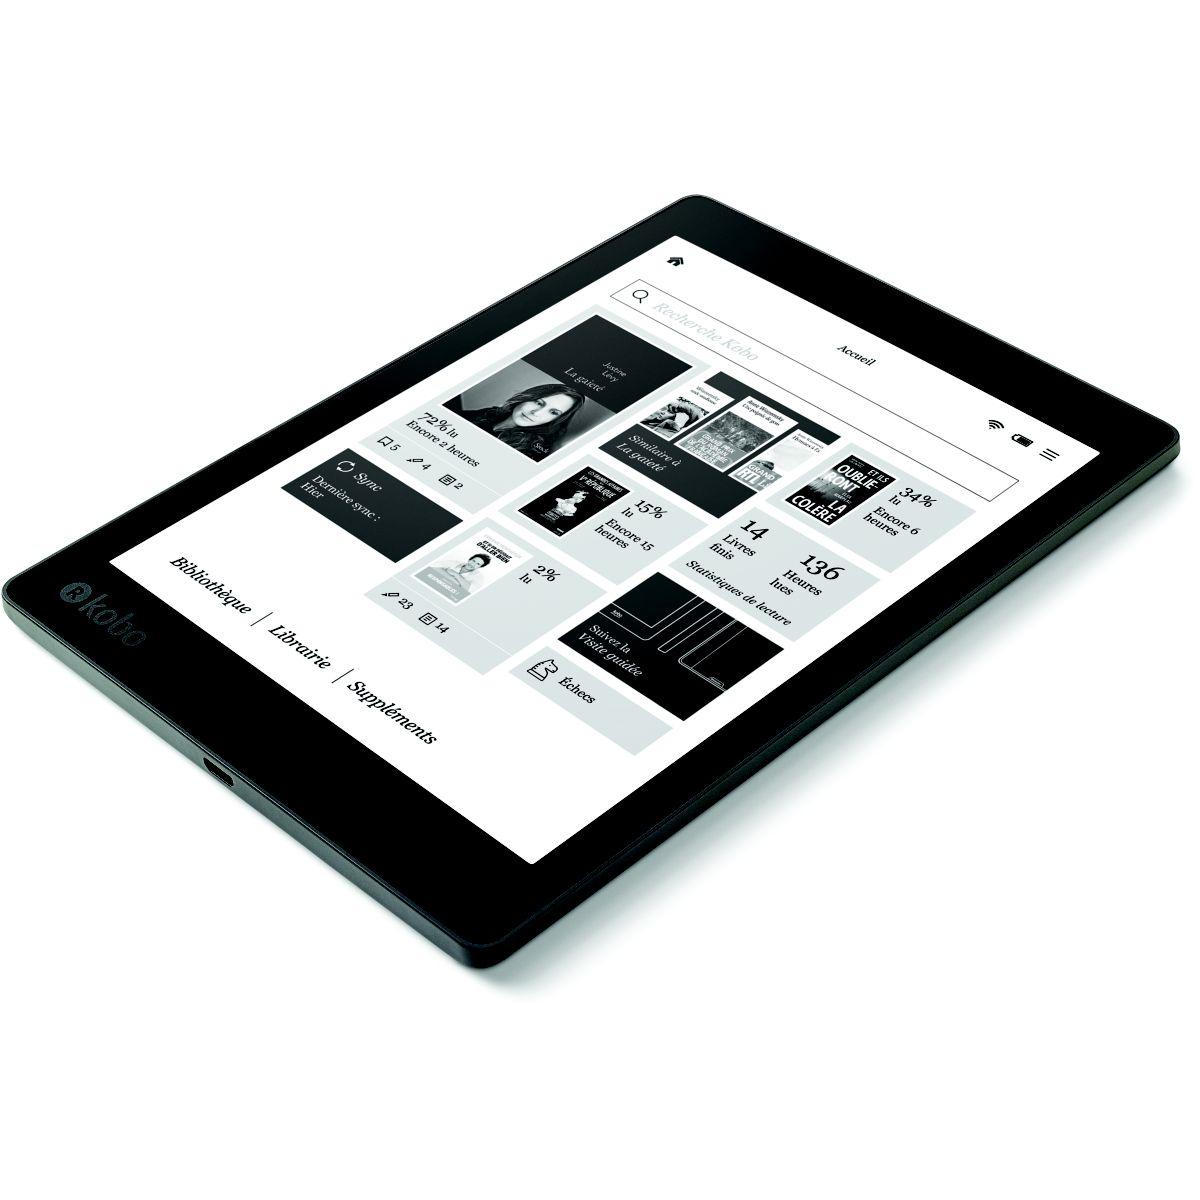 E-book kobo aura one - 2% de remise immédiate avec le code : cool2 (photo)